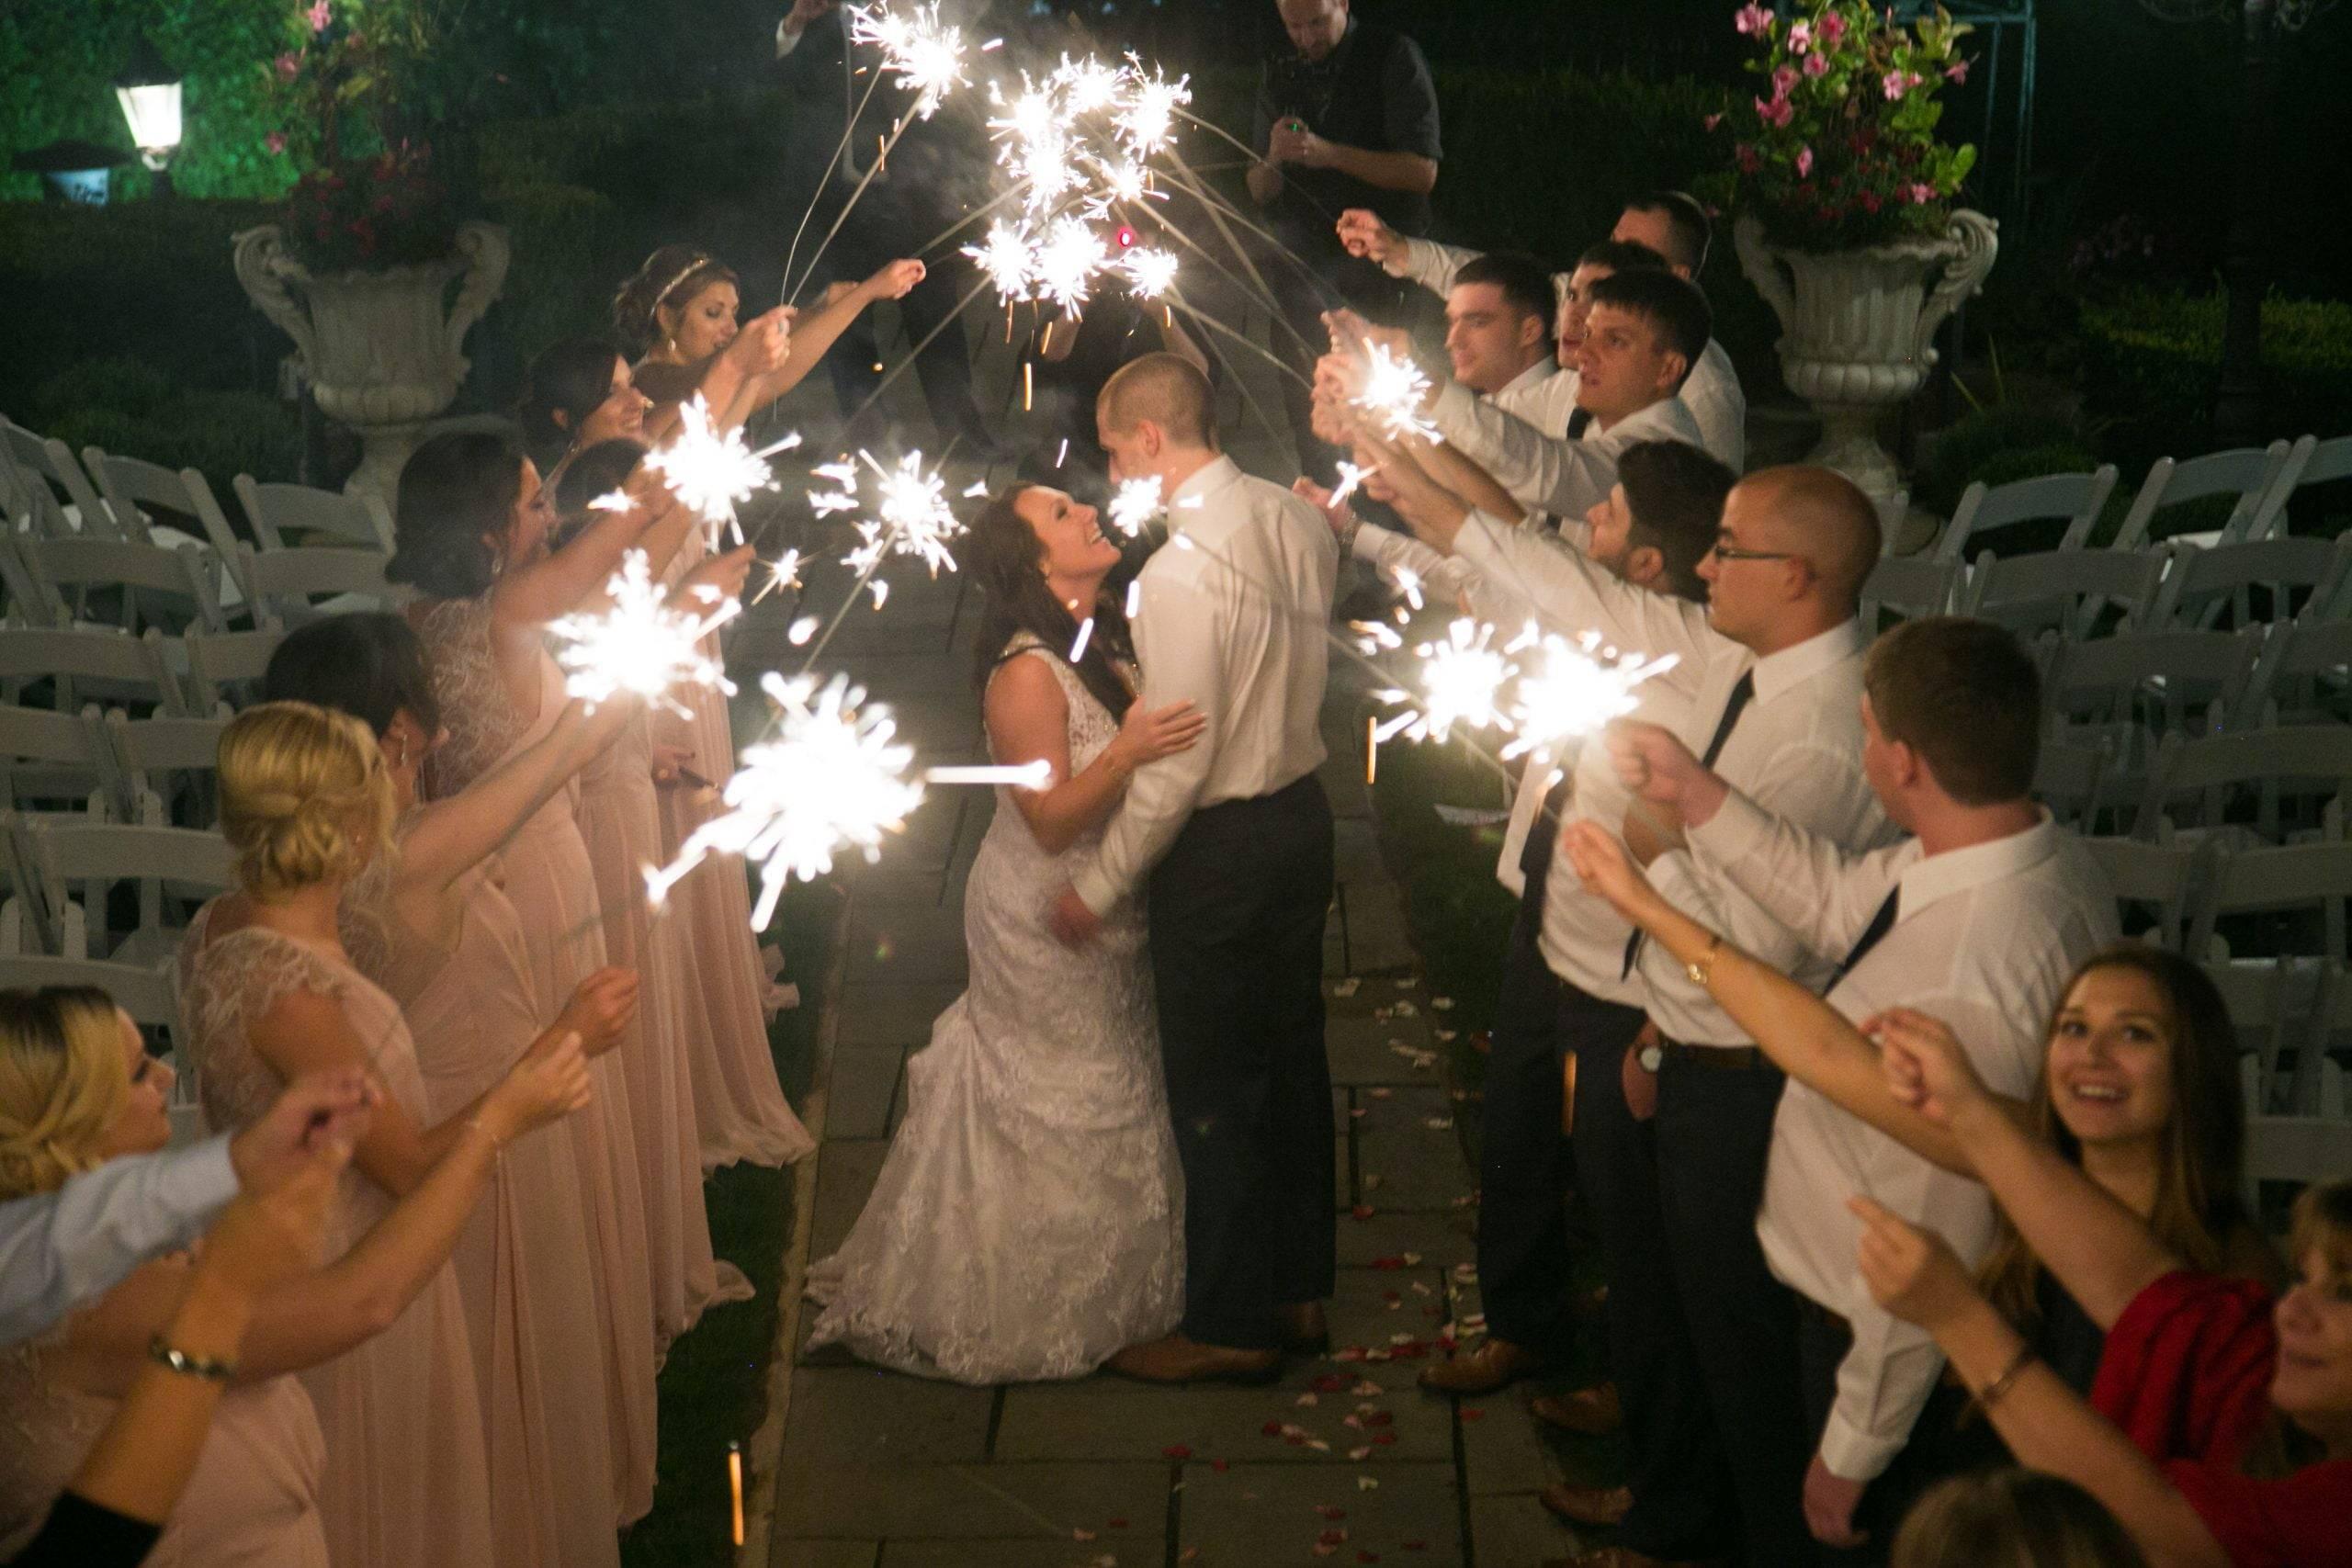 Park Savoy bride and groom kiss under sparklers